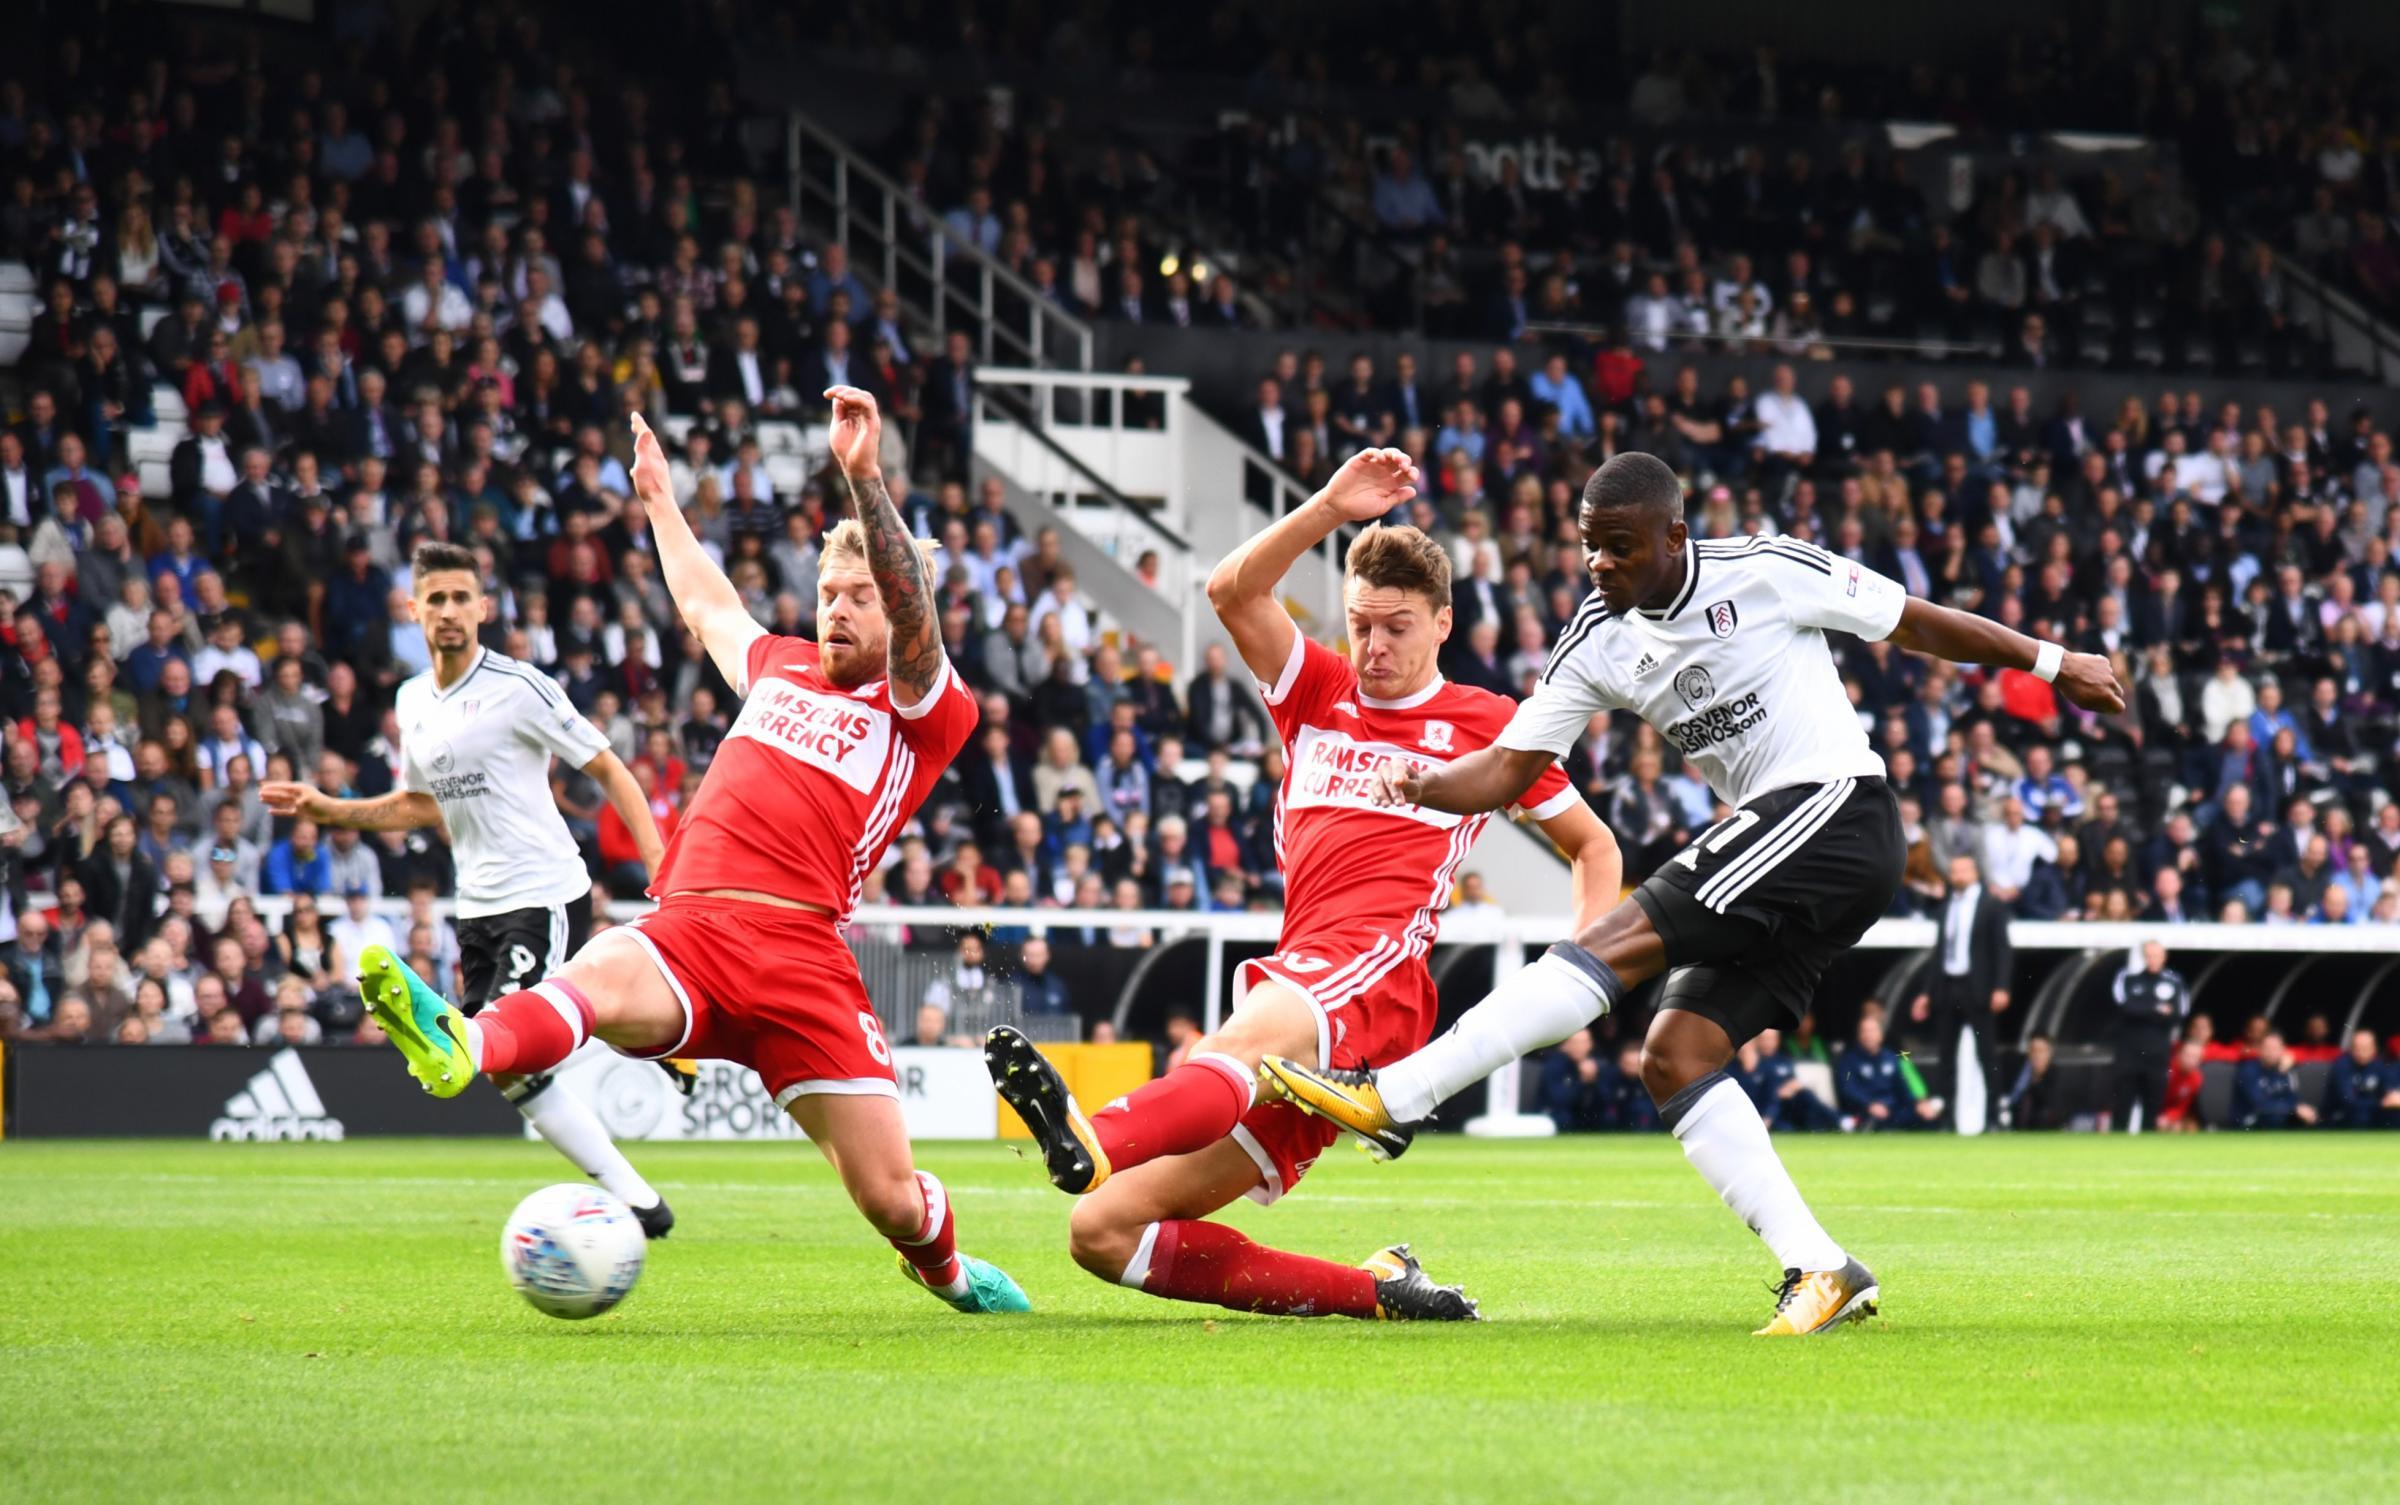 Fulham vs Boro: The last five meetings